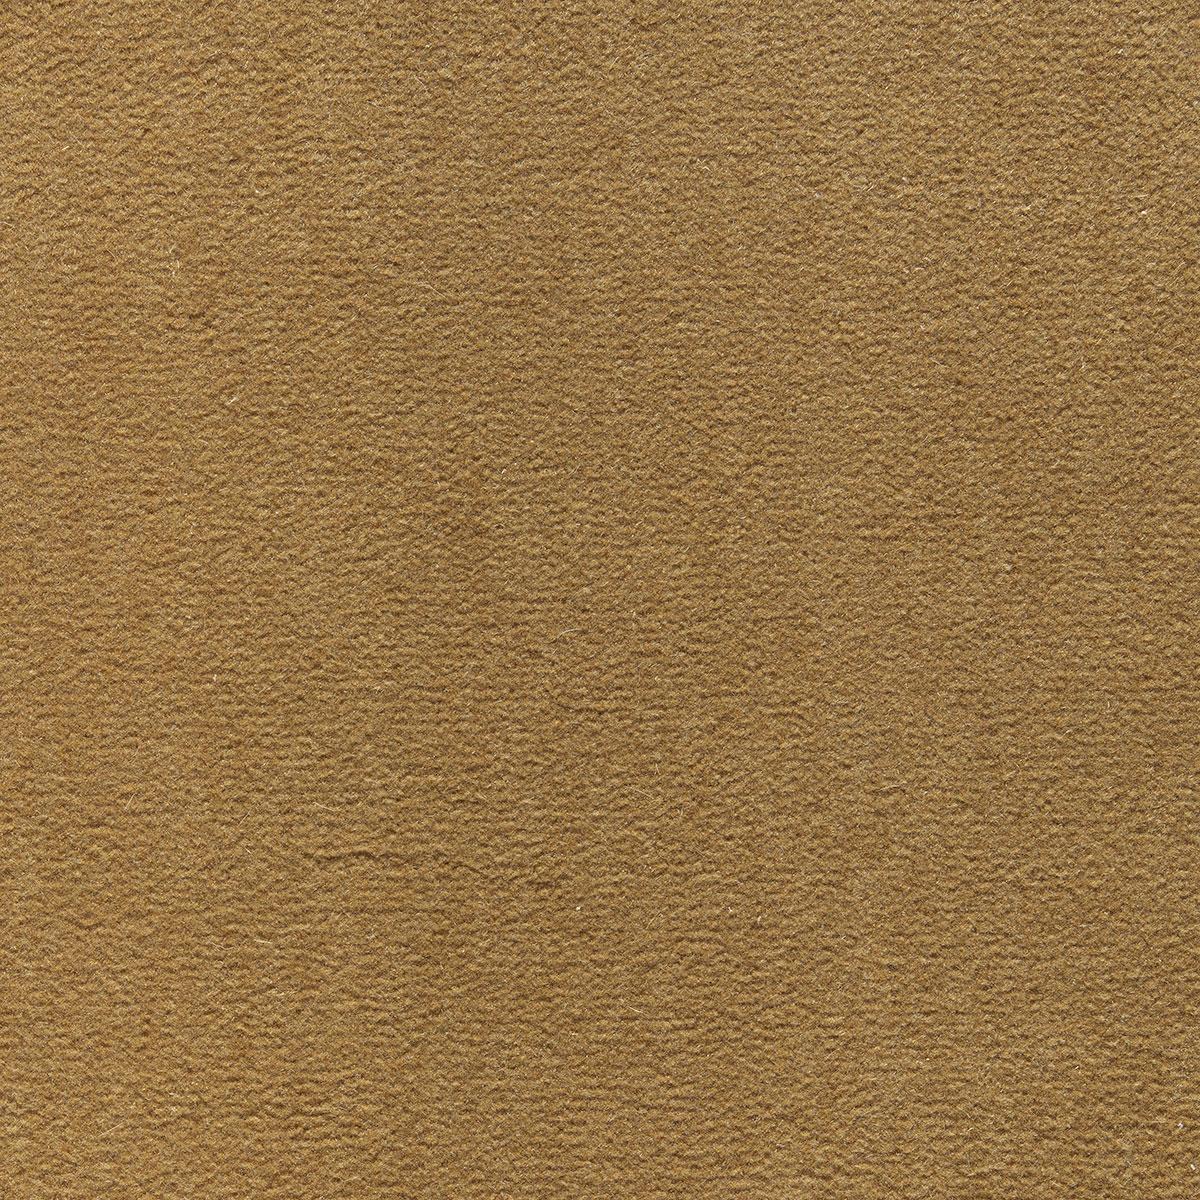 Mckenna S Gold J Mish Mills Wool Carpet Rugs